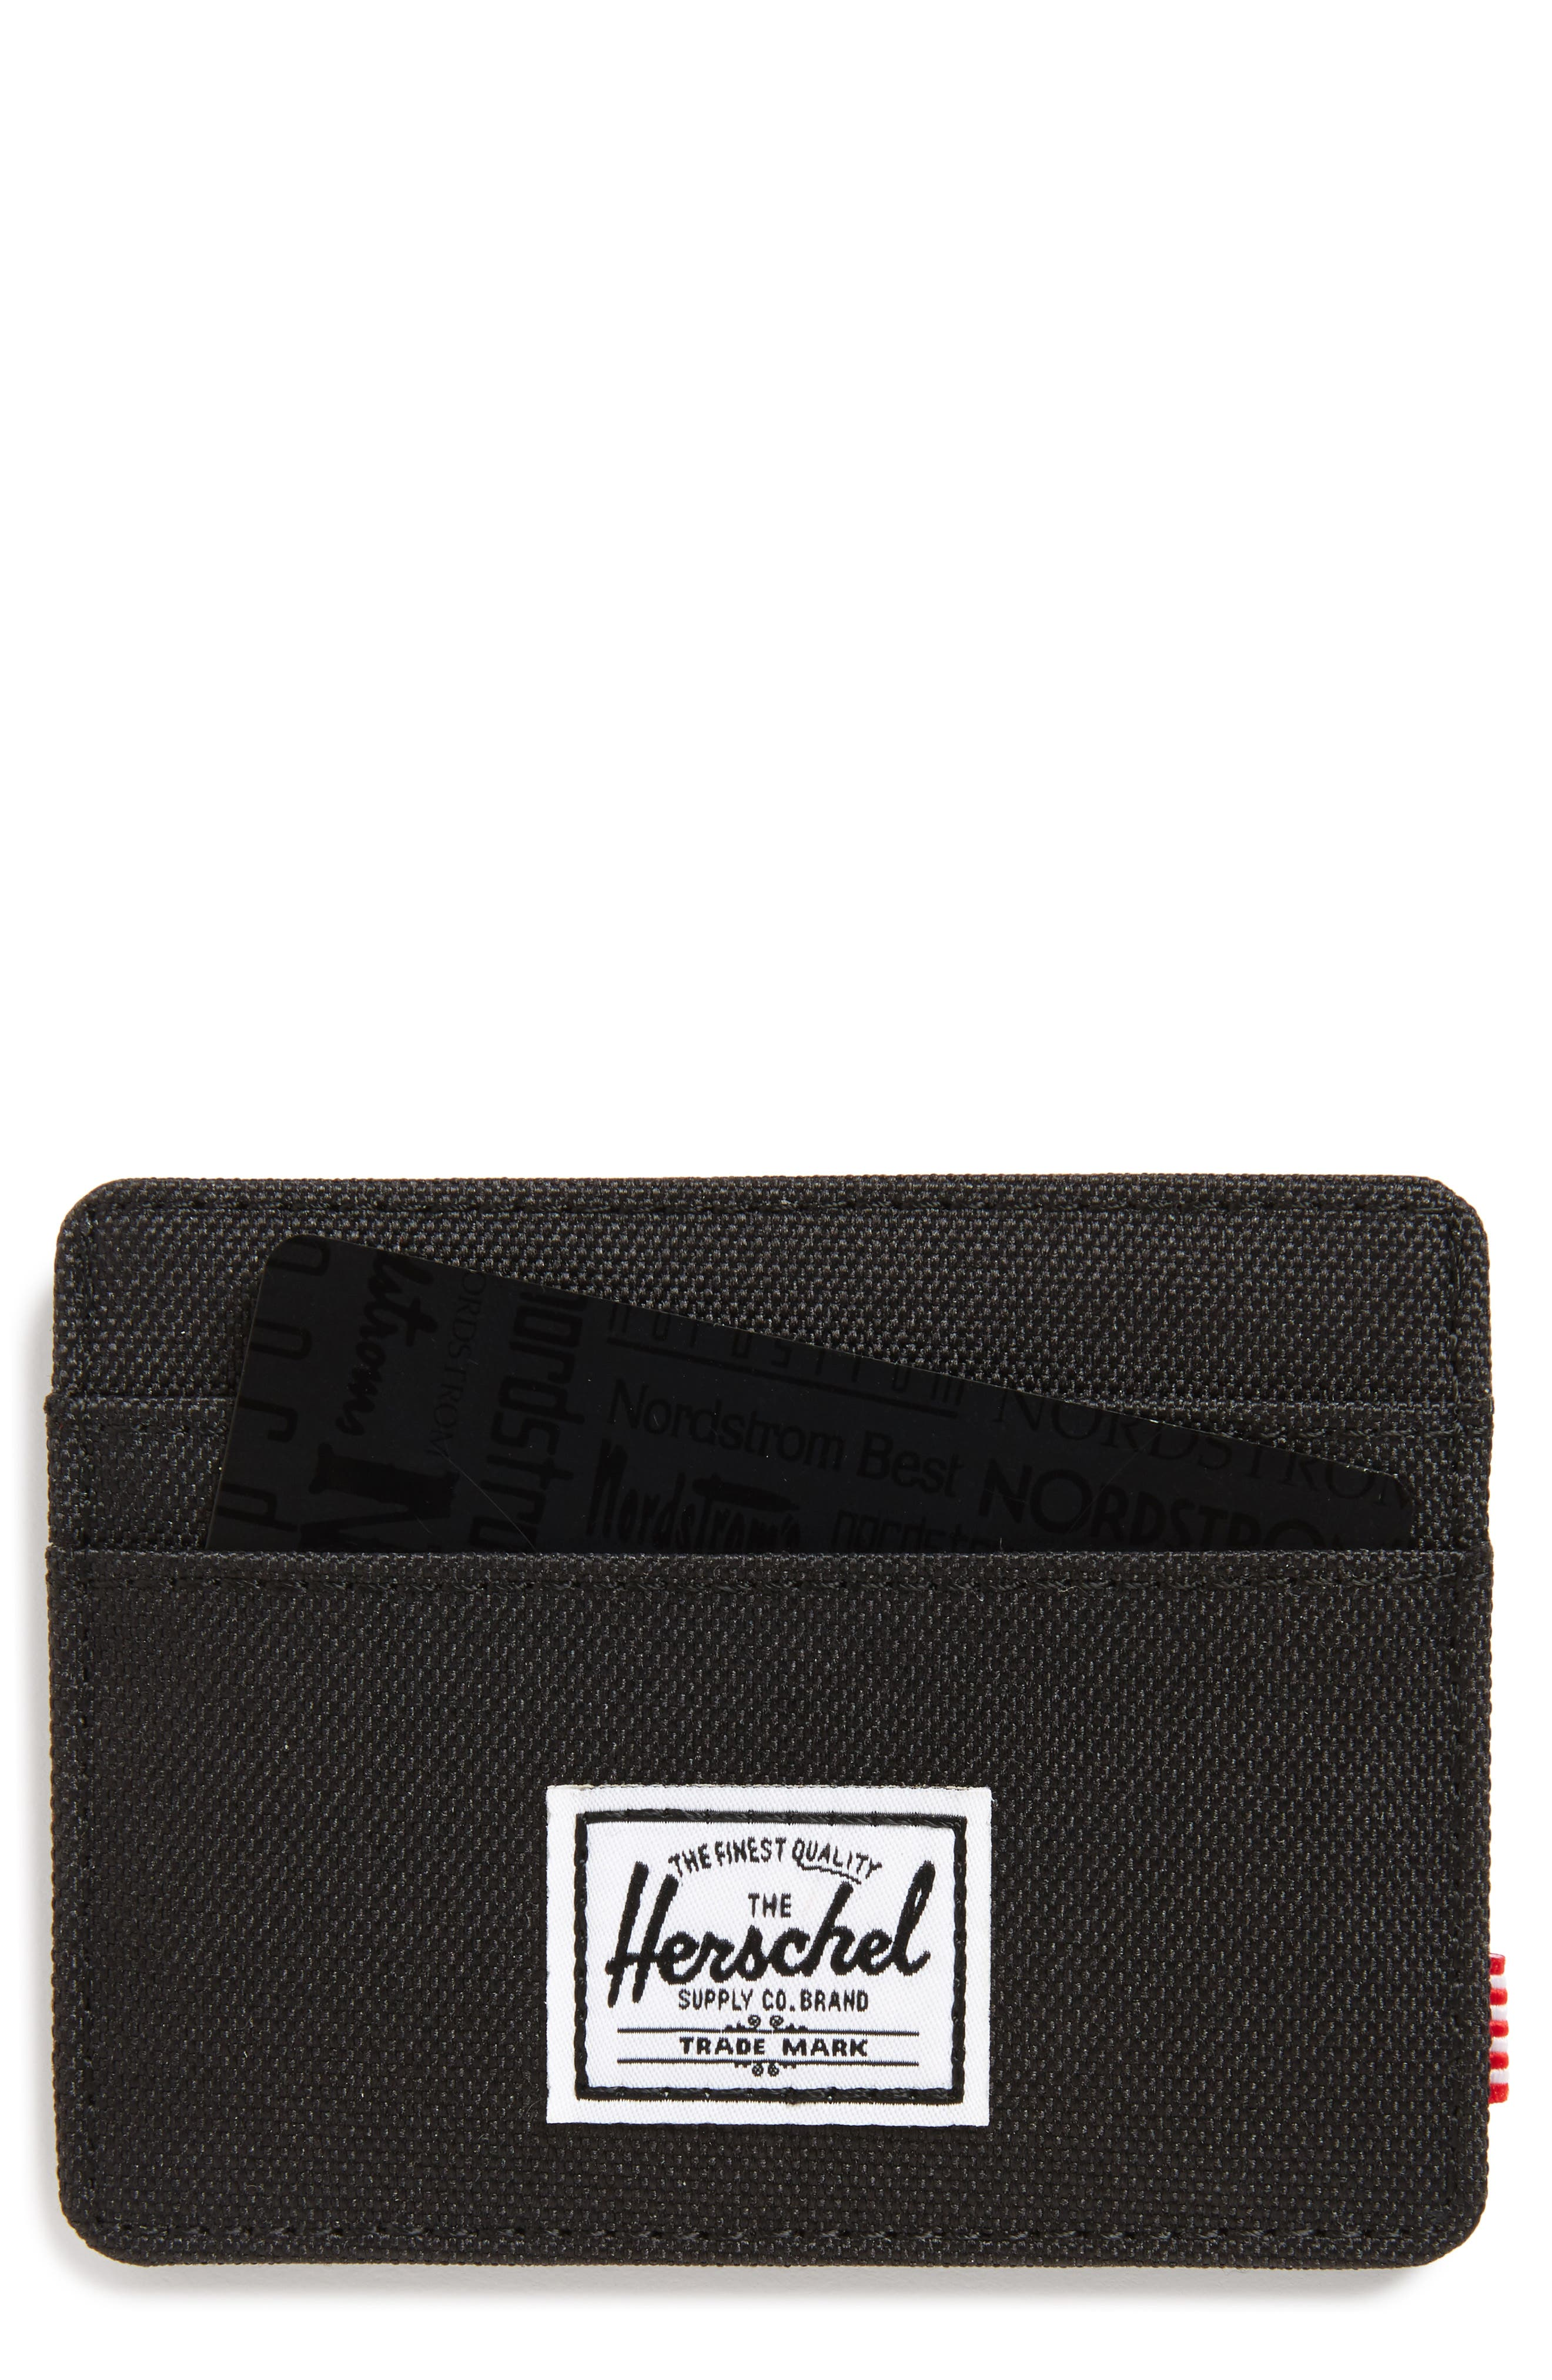 Charlie RFID Card Case,                         Main,                         color, Black